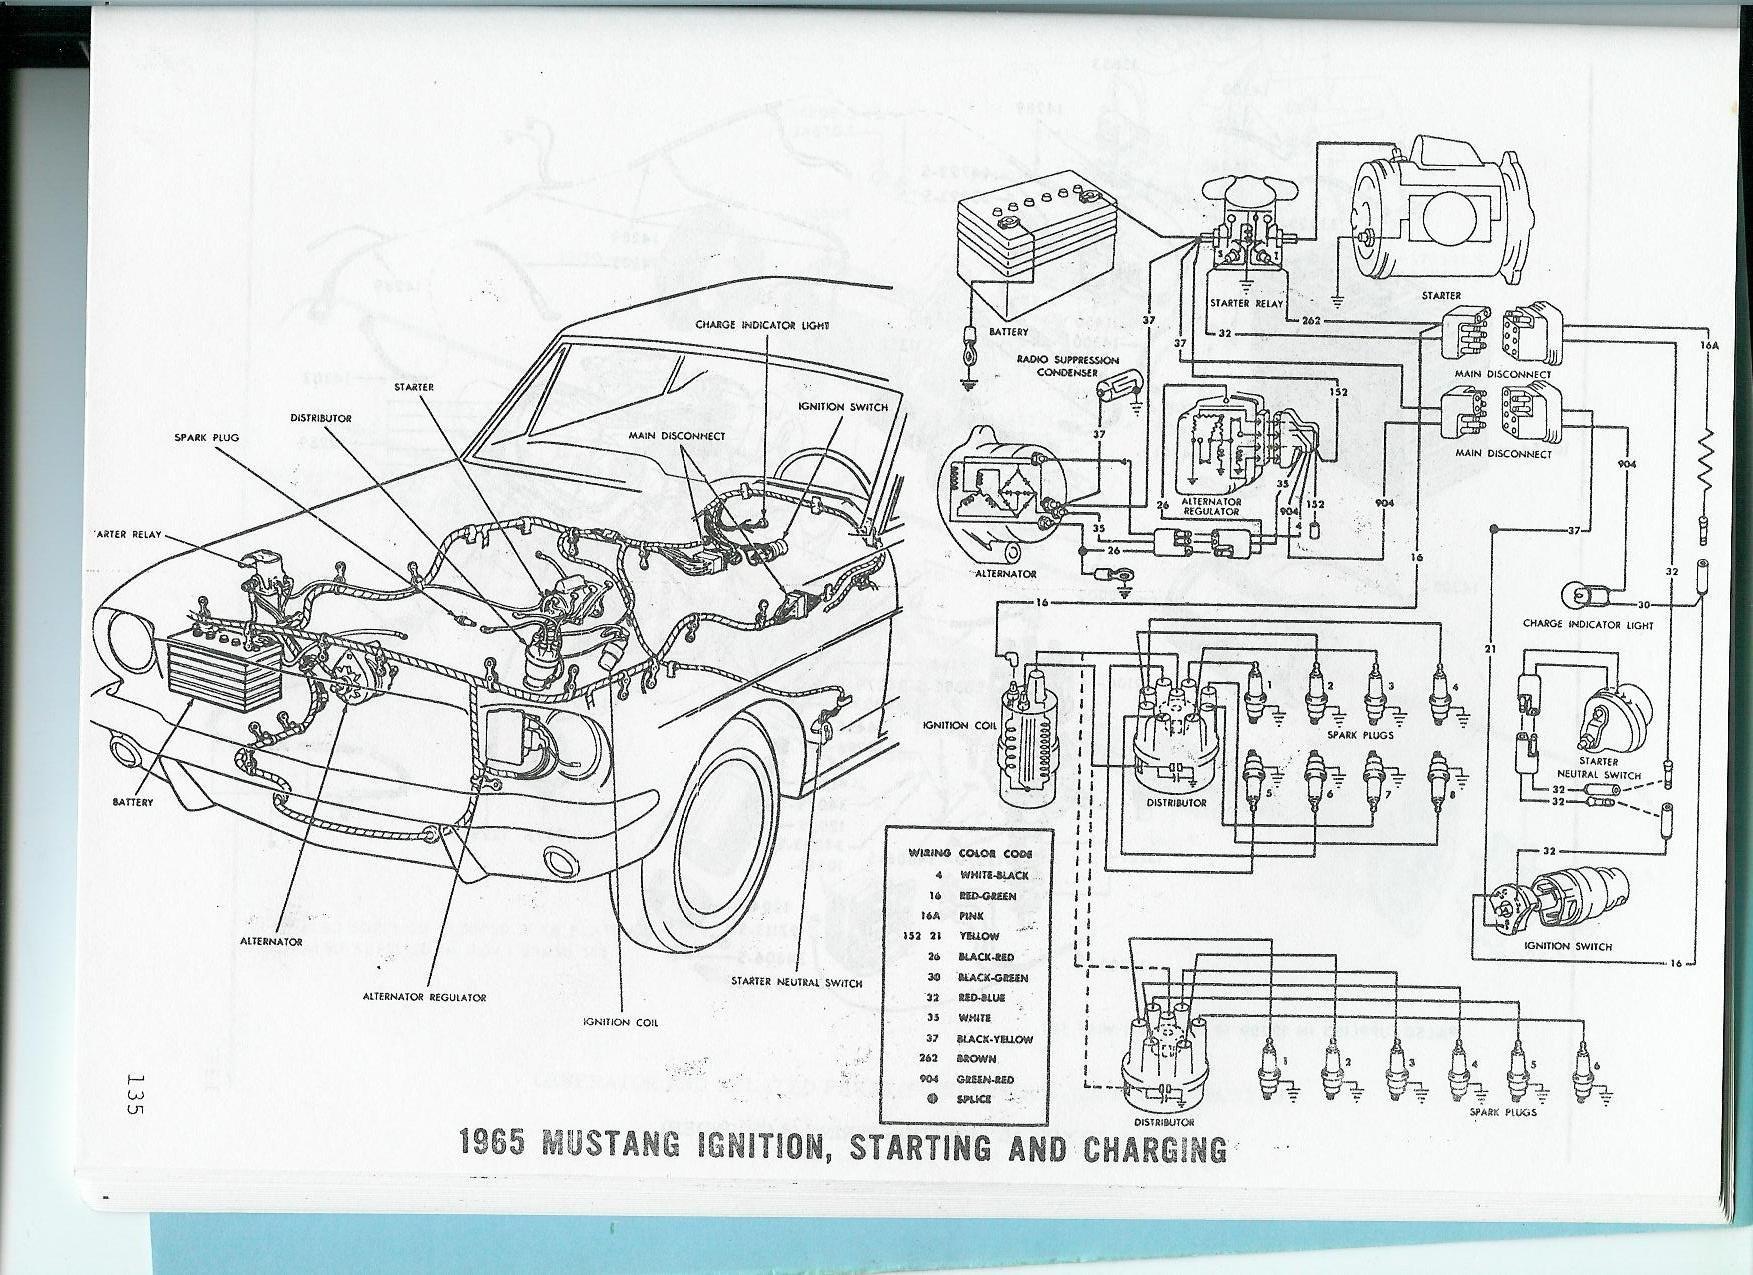 64 Ford Fairlane Wiring Diagram Starting Systemon 1966 Mustang Ignition Wiring Diagram